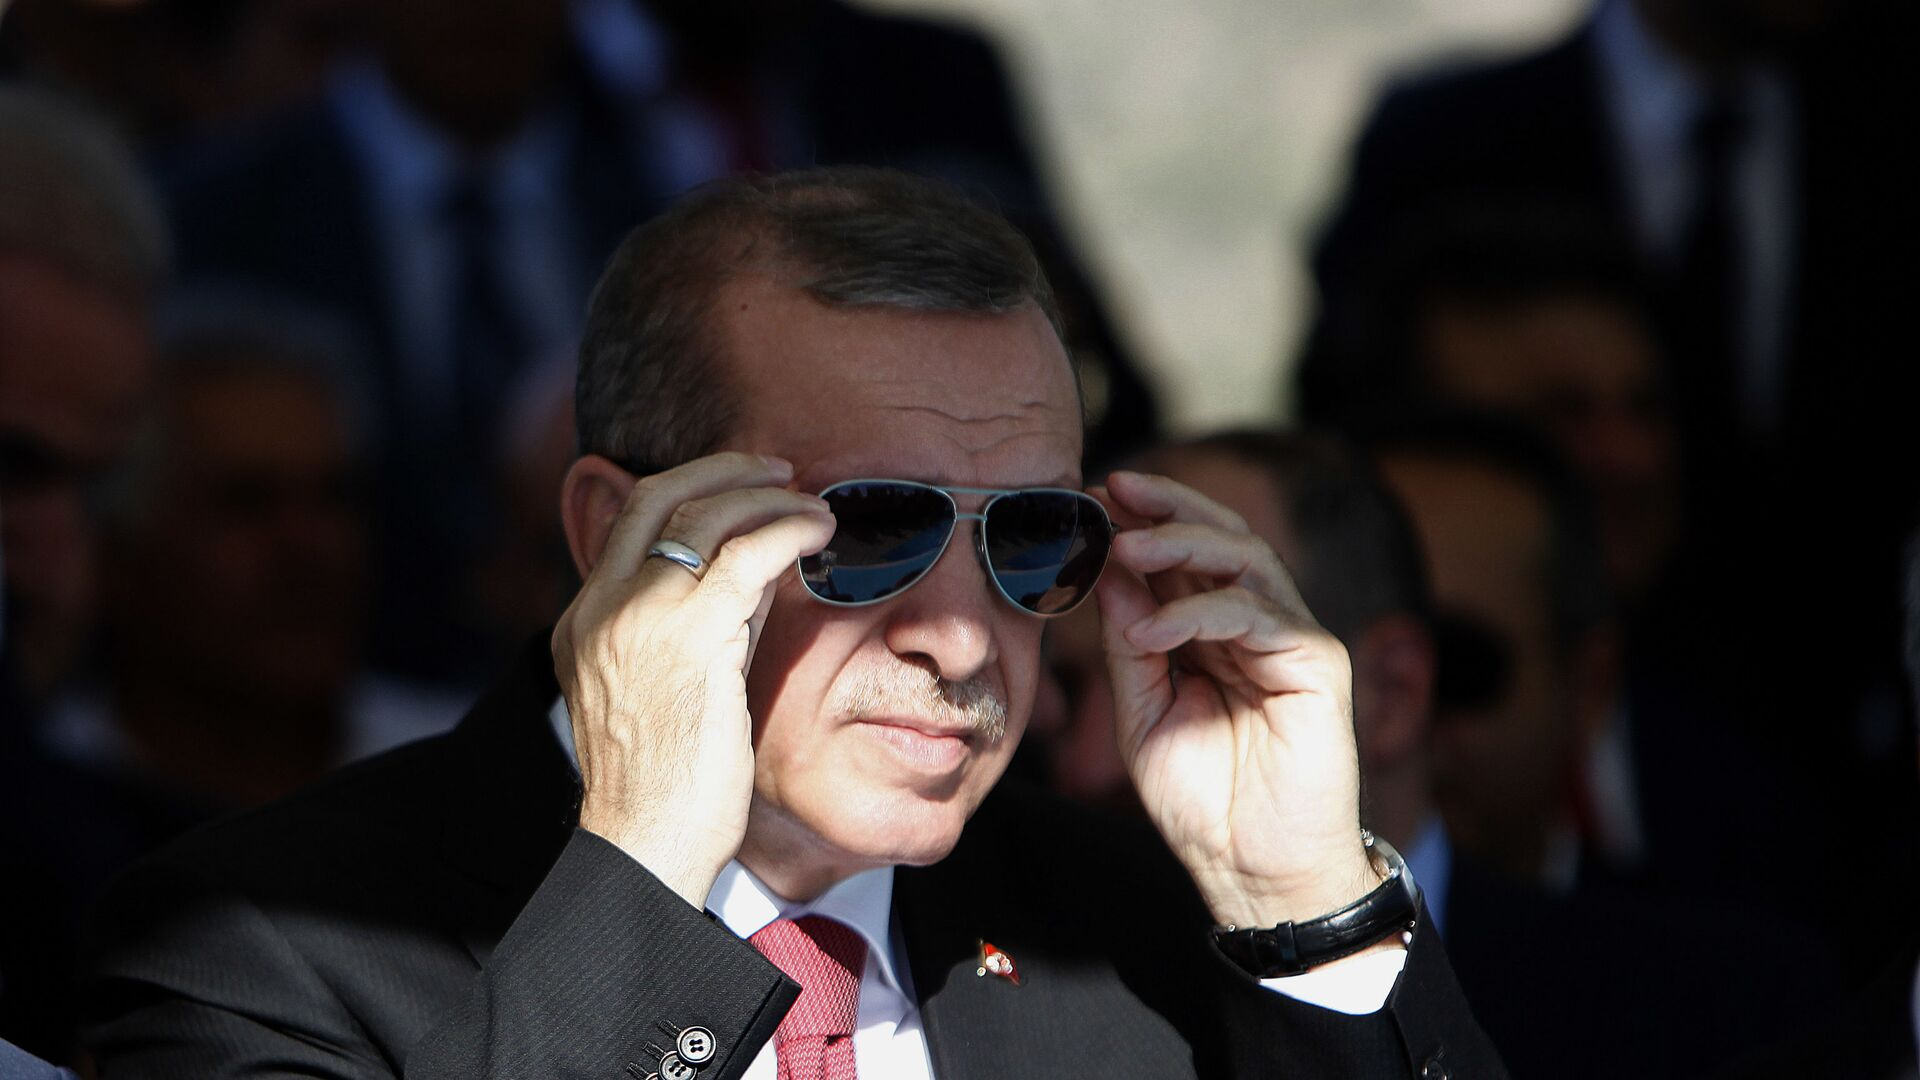 Президент Турции Реджеп Эрдоган - Sputnik Ўзбекистон, 1920, 07.09.2021